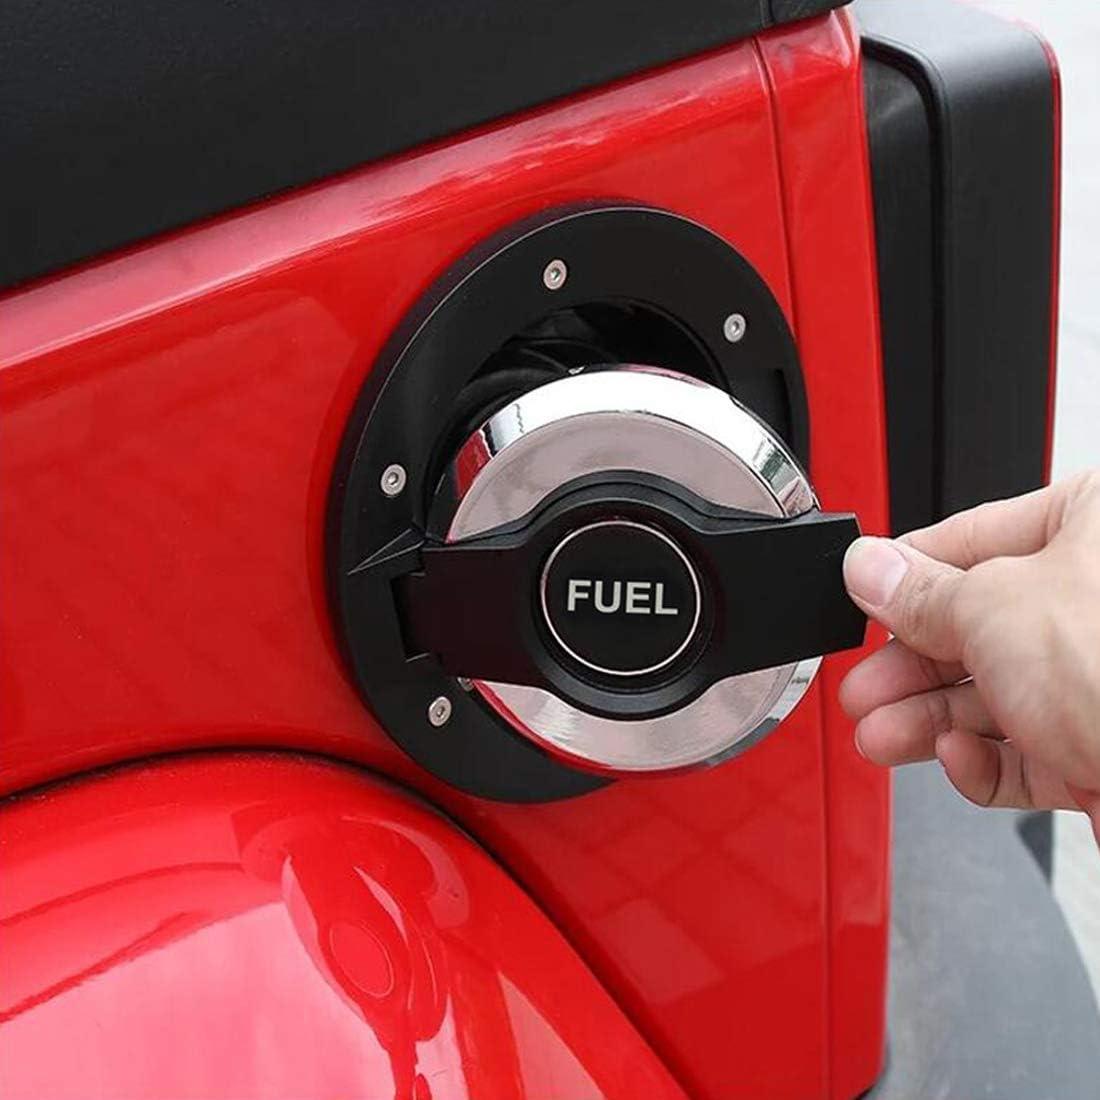 SKTYANTS Fuel Tank Cover Gas Lid Filler Cap Metal ABS Gas Cap Cover for Jeep Wrangler jk 2007-2018 Black